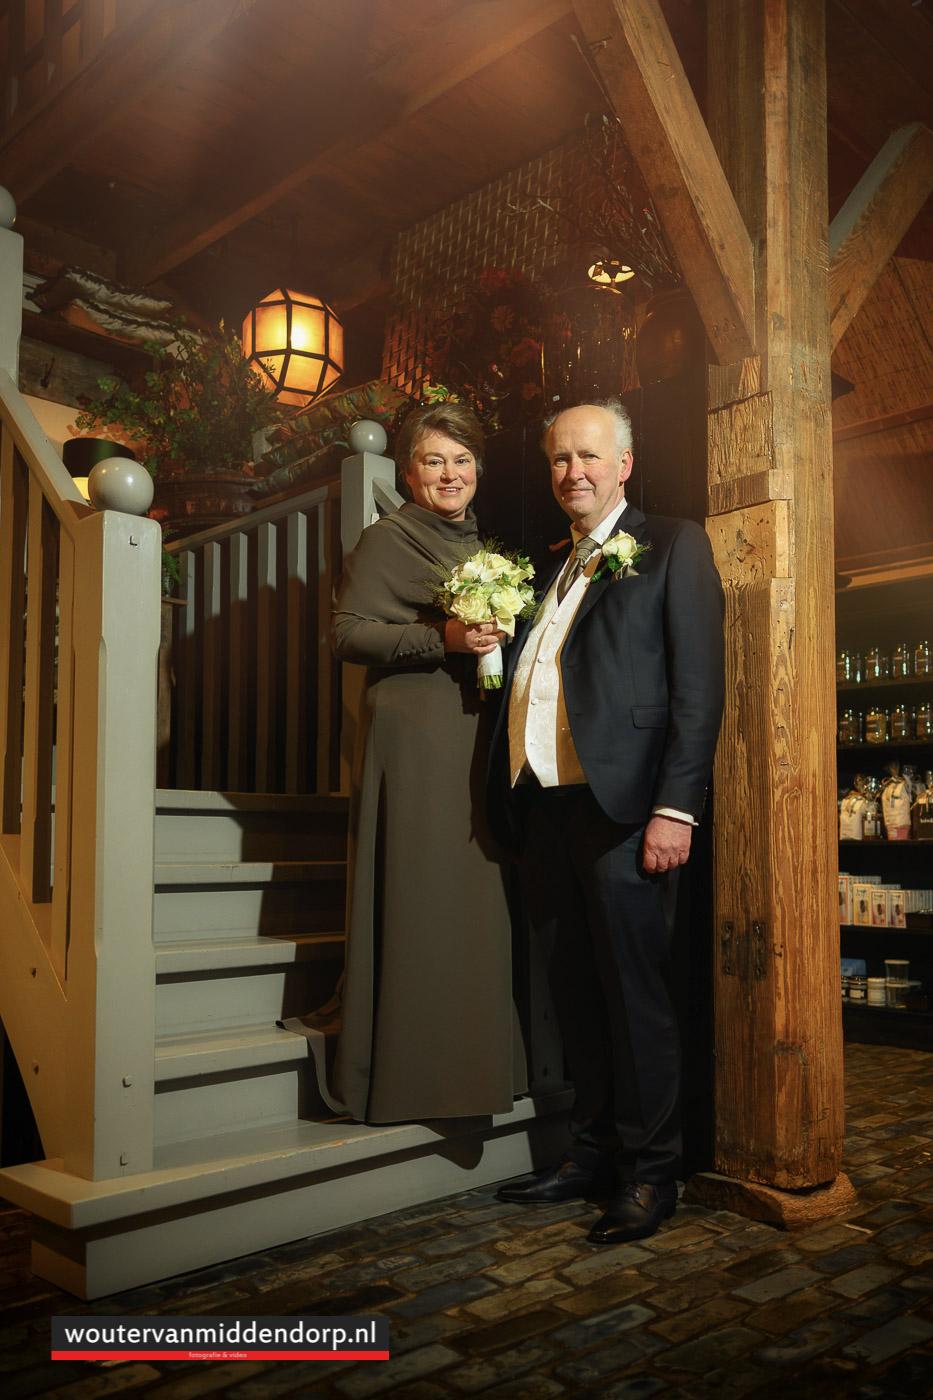 bruidsfotografie Wouter van Middendorp Uddel Elspeet Barneveld, omgeving trouwfotograaf-13